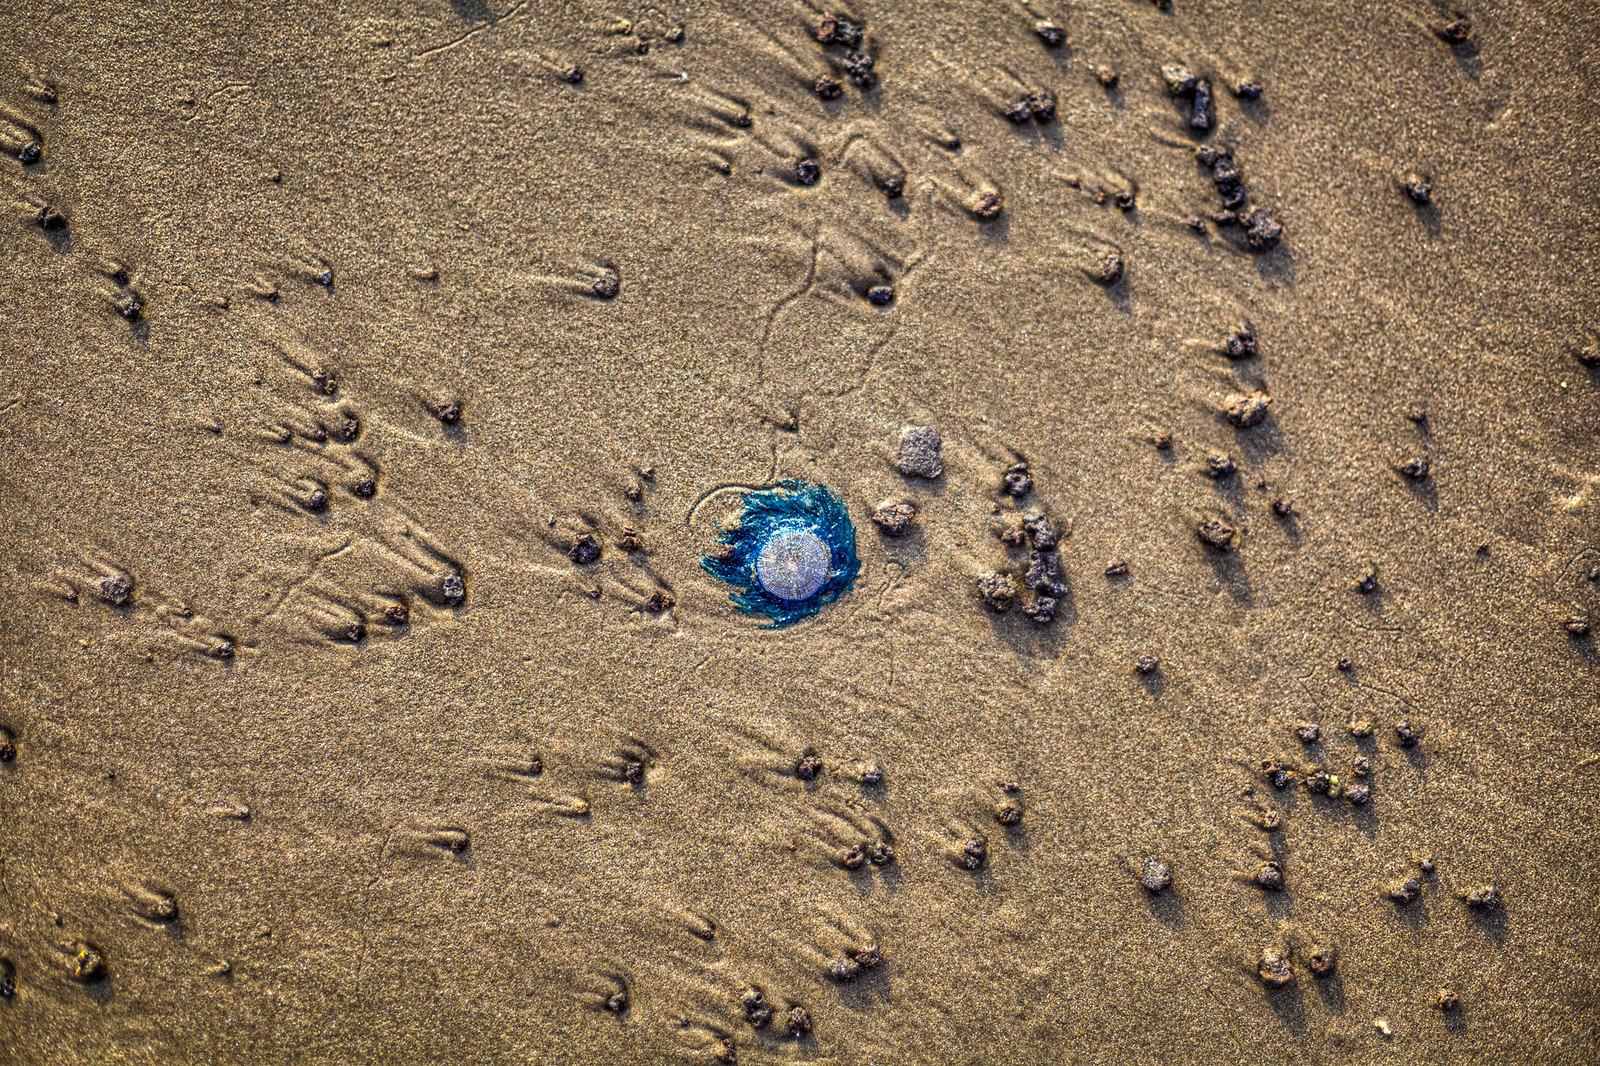 Alien Life (Porpita Porpita) at the Ashwem Beach